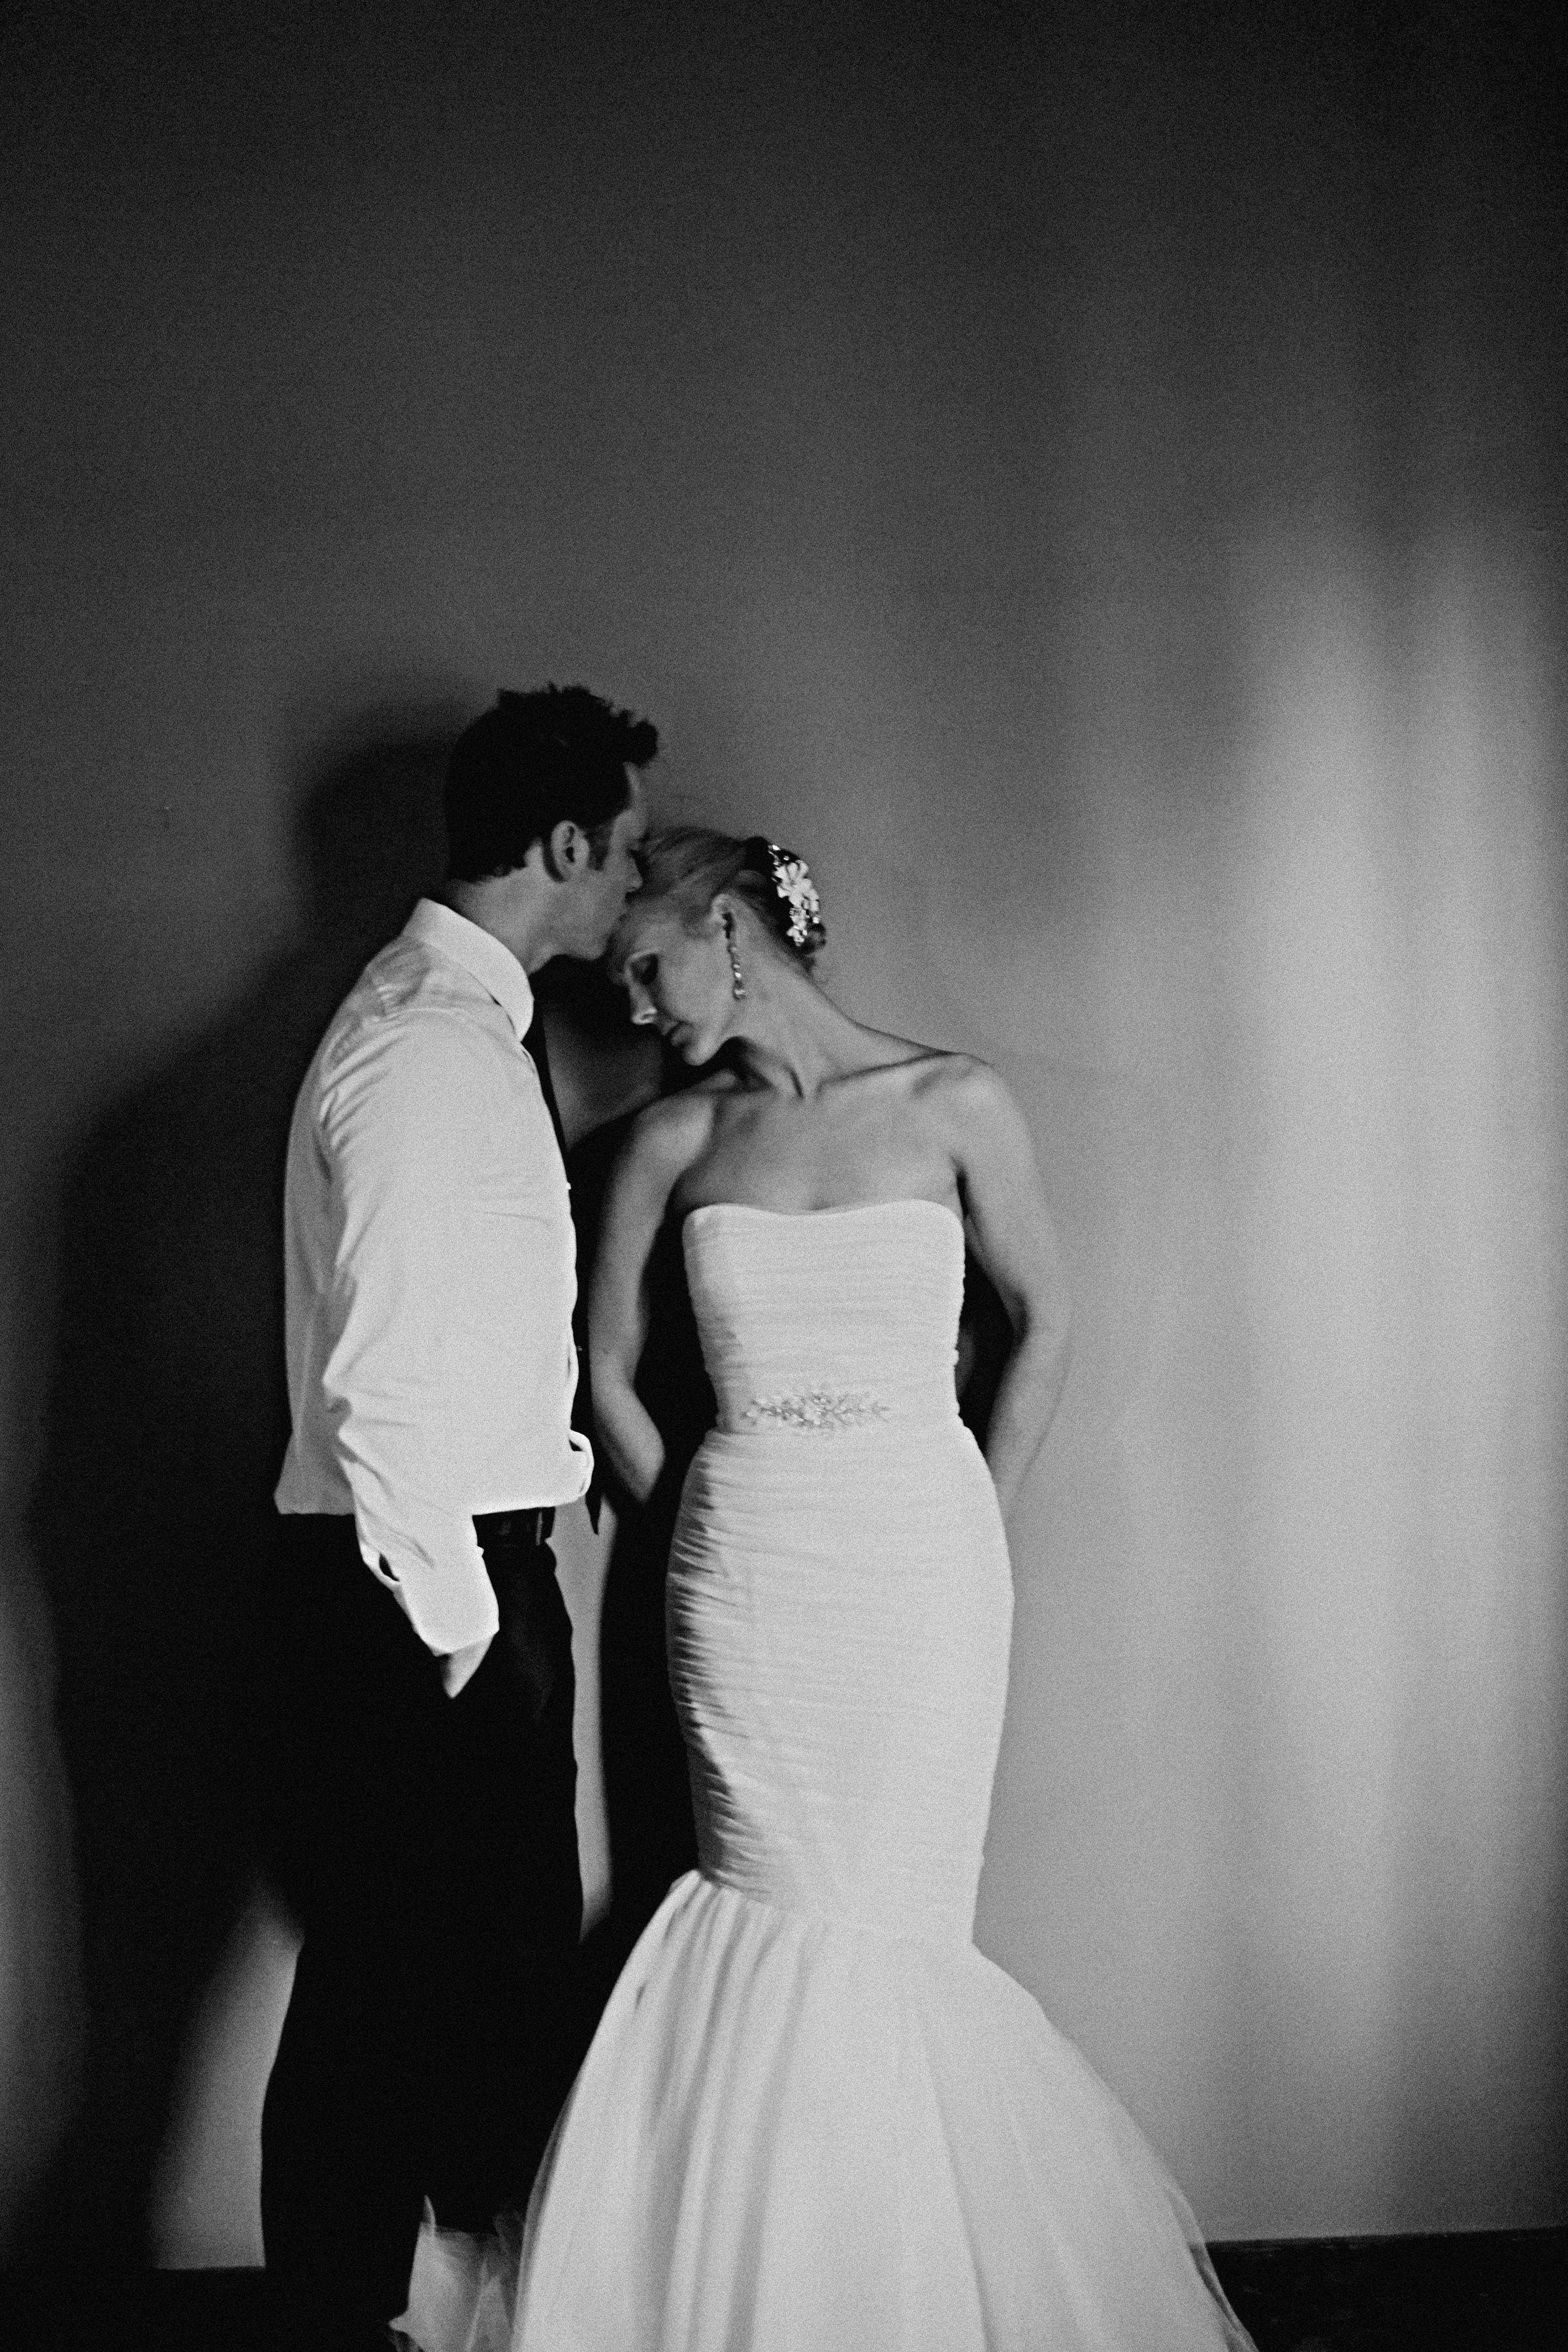 Wedding; Romantic Bride And Groom Pose